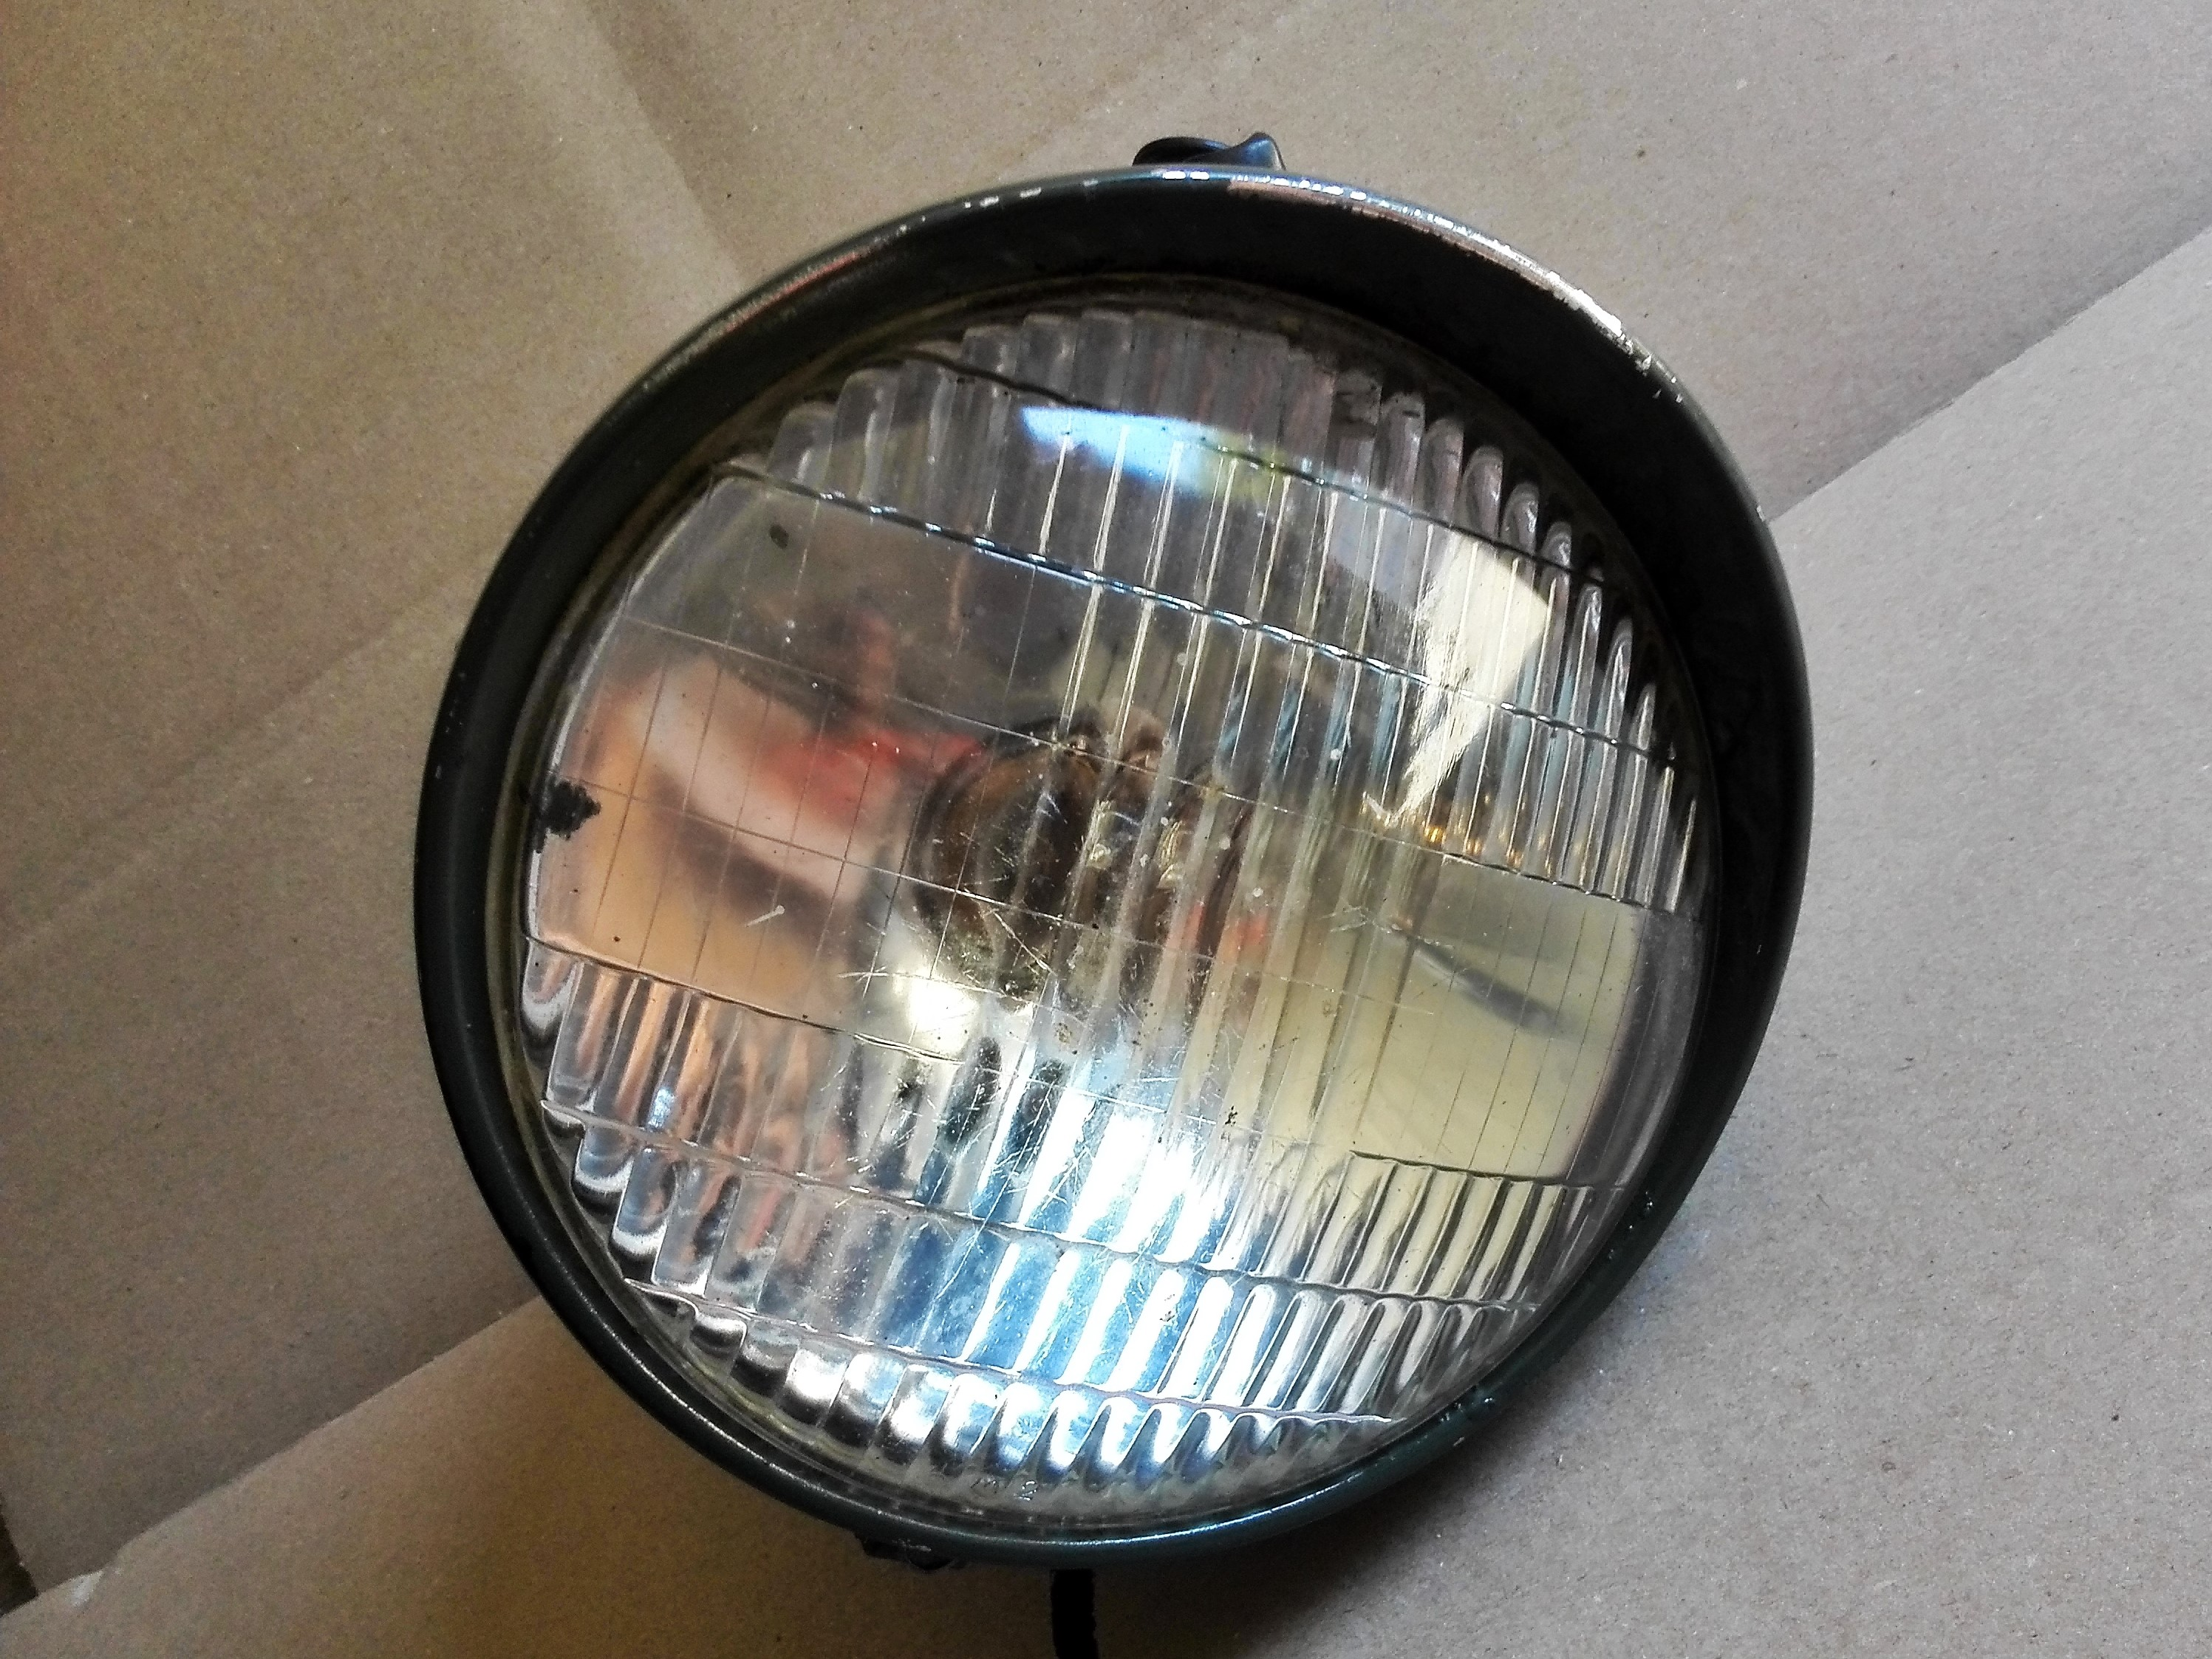 dnepr k750 bmw scheinwerfer lampe headlamp old style ebay. Black Bedroom Furniture Sets. Home Design Ideas